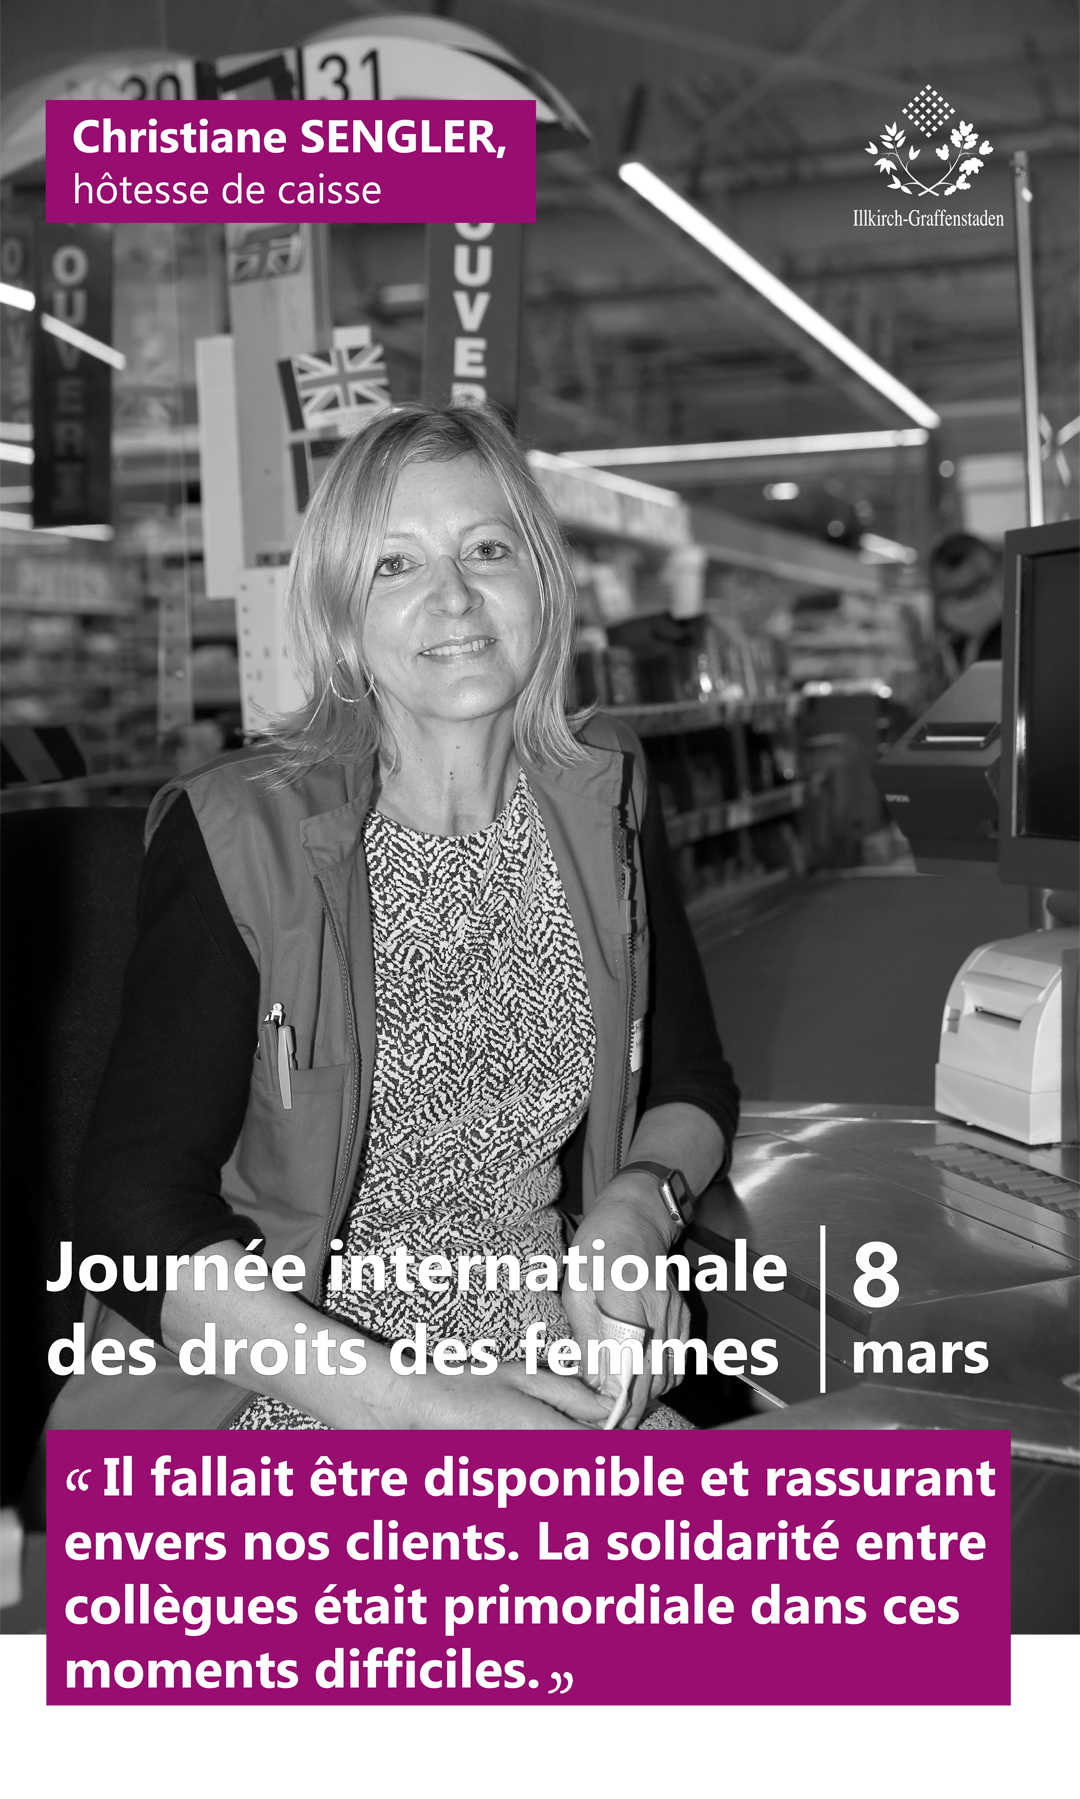 Christiane Sengler - Journée internationale des droits des femmes